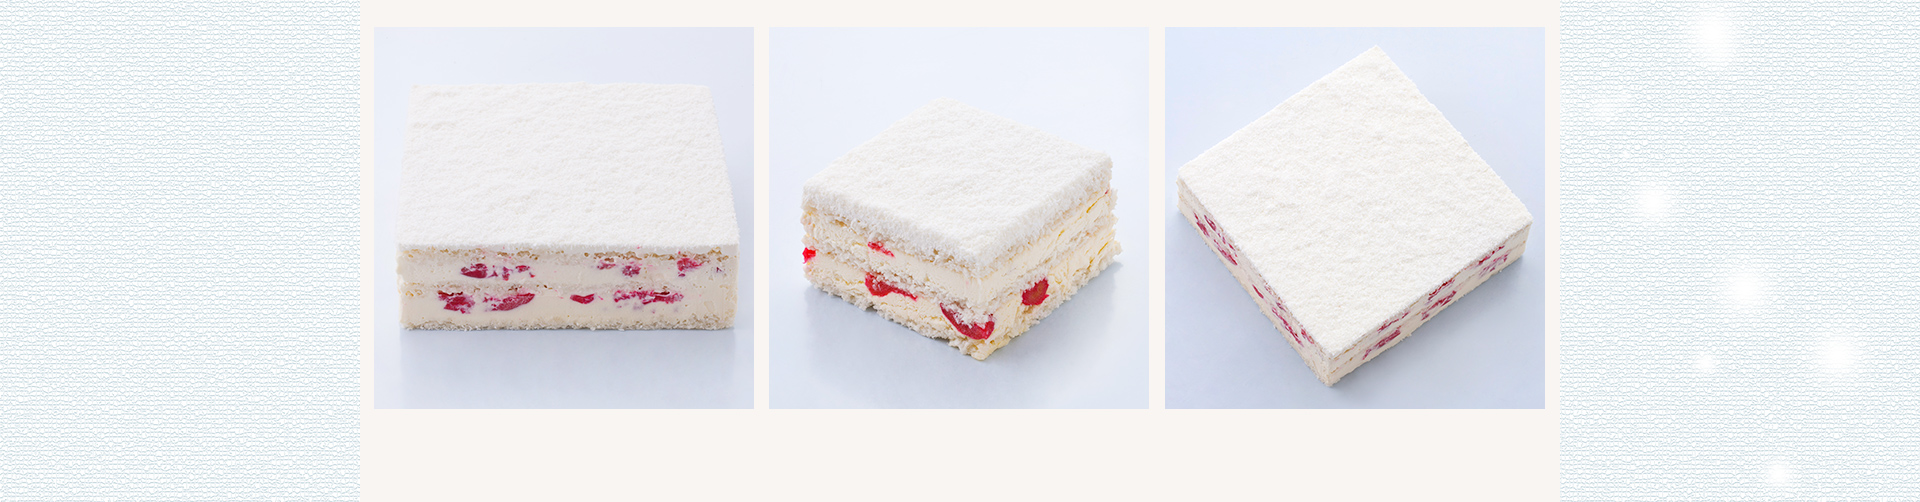 ebeecake小蜜蜂蛋糕 梦幻|松露巧克力蛋糕